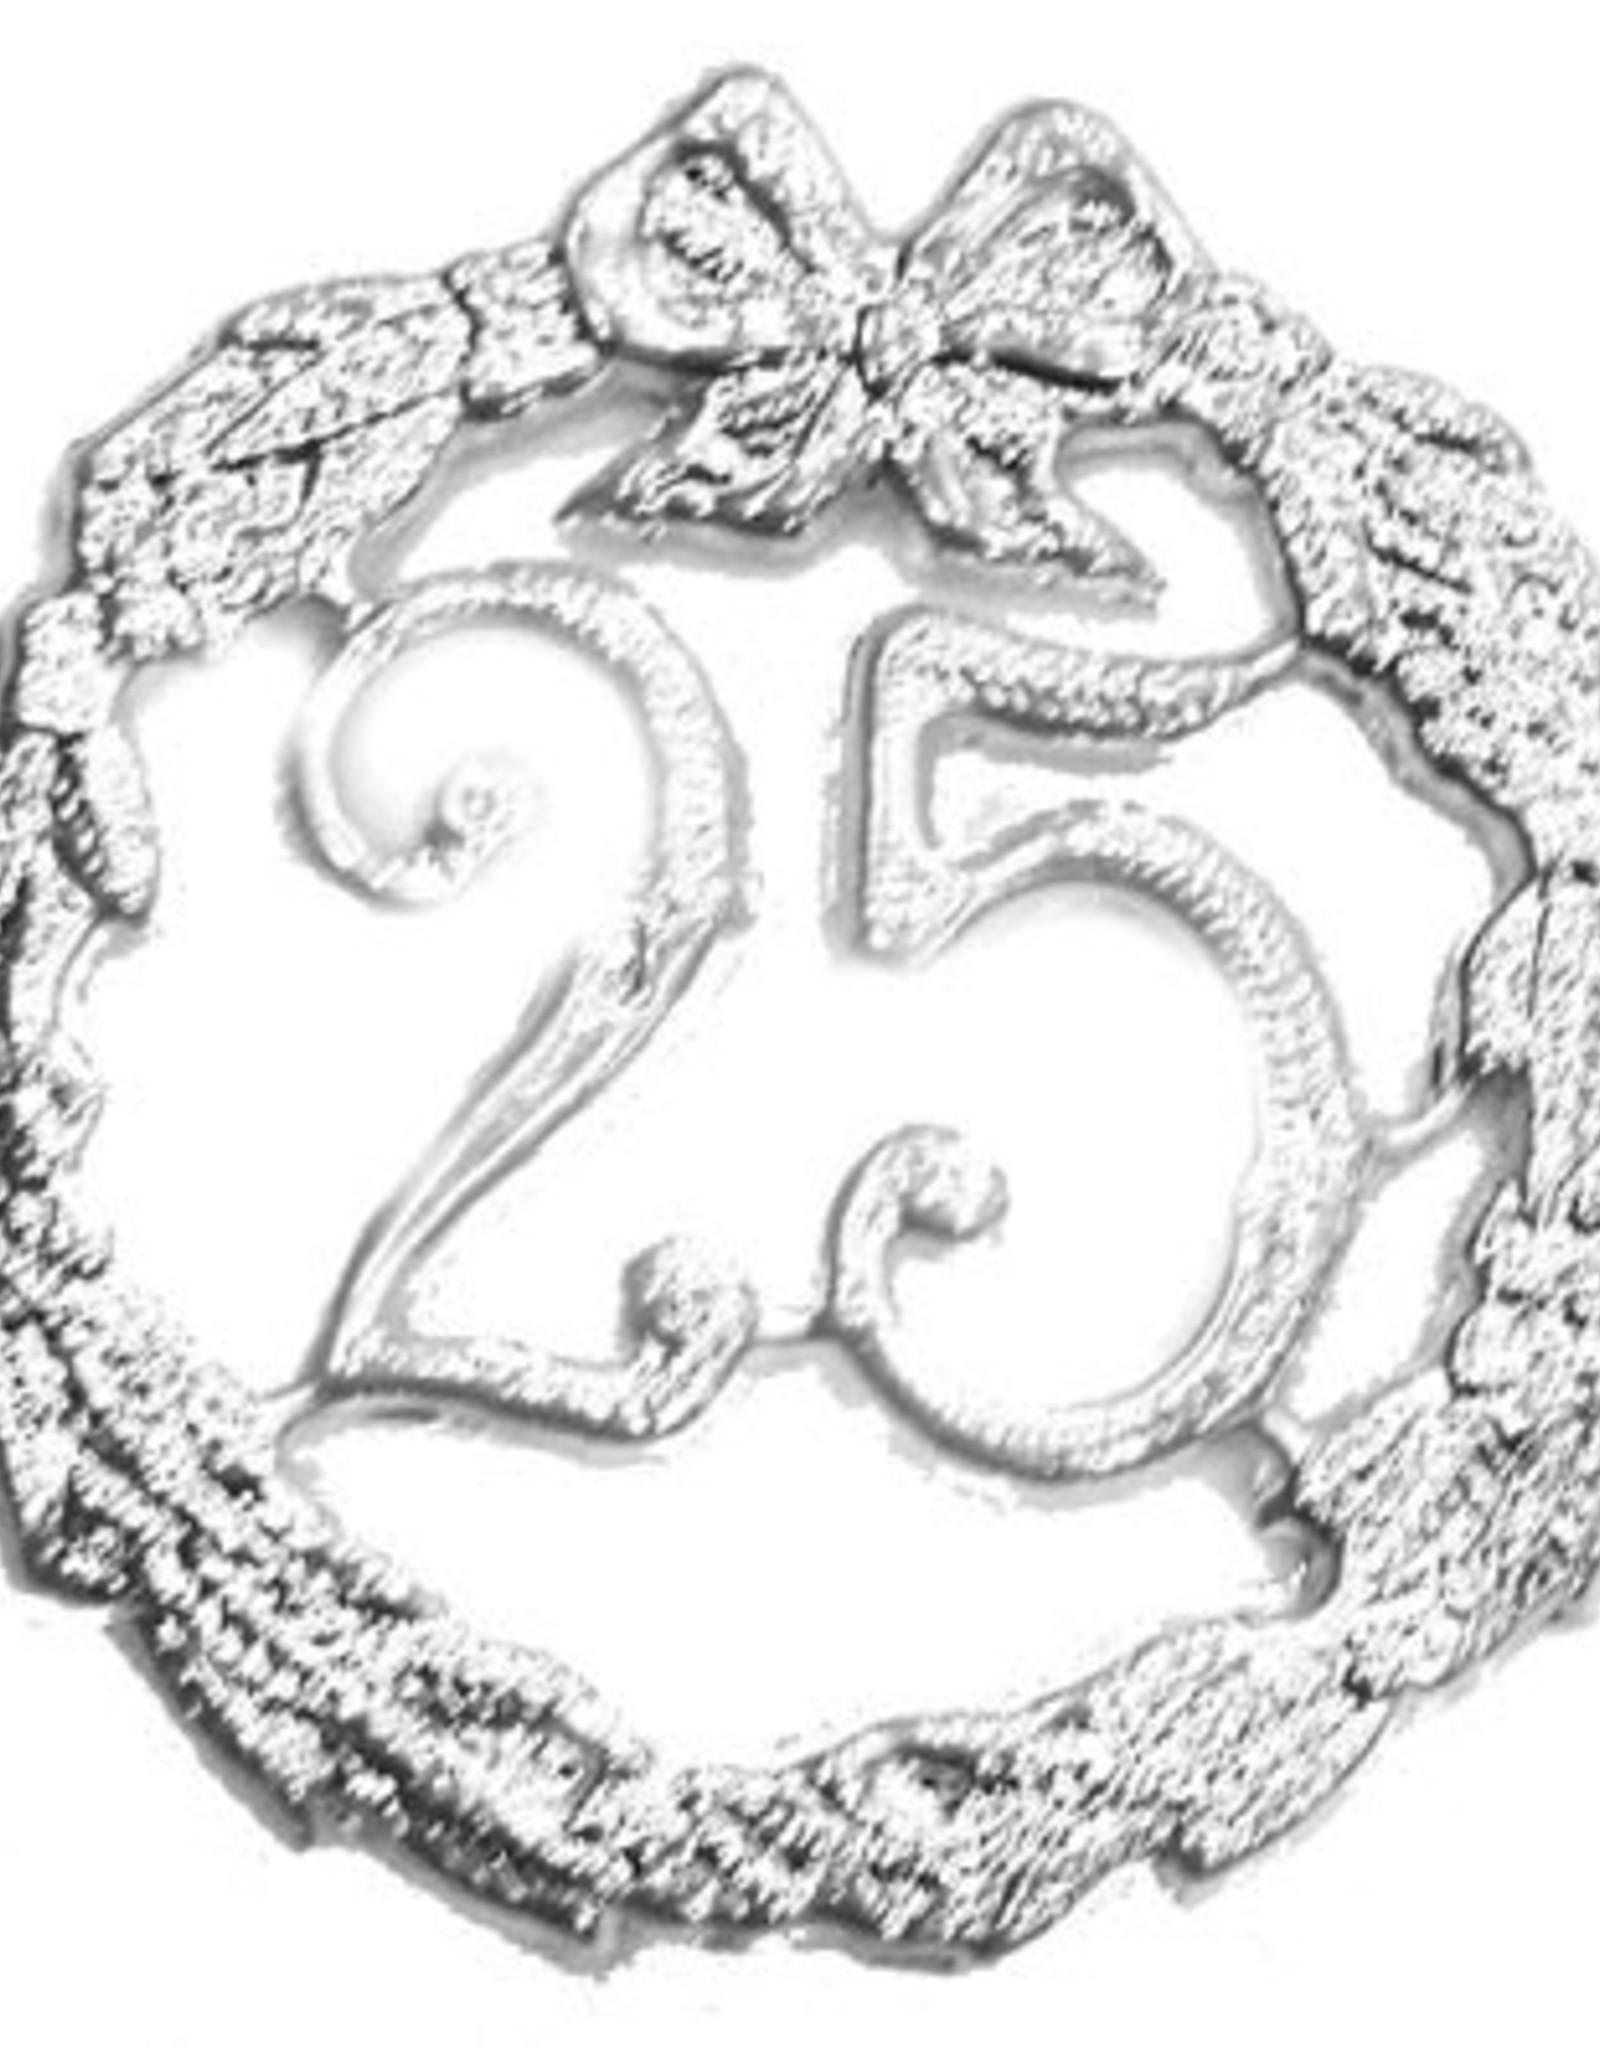 ESPA decoratie 25 zilver 20 cm.